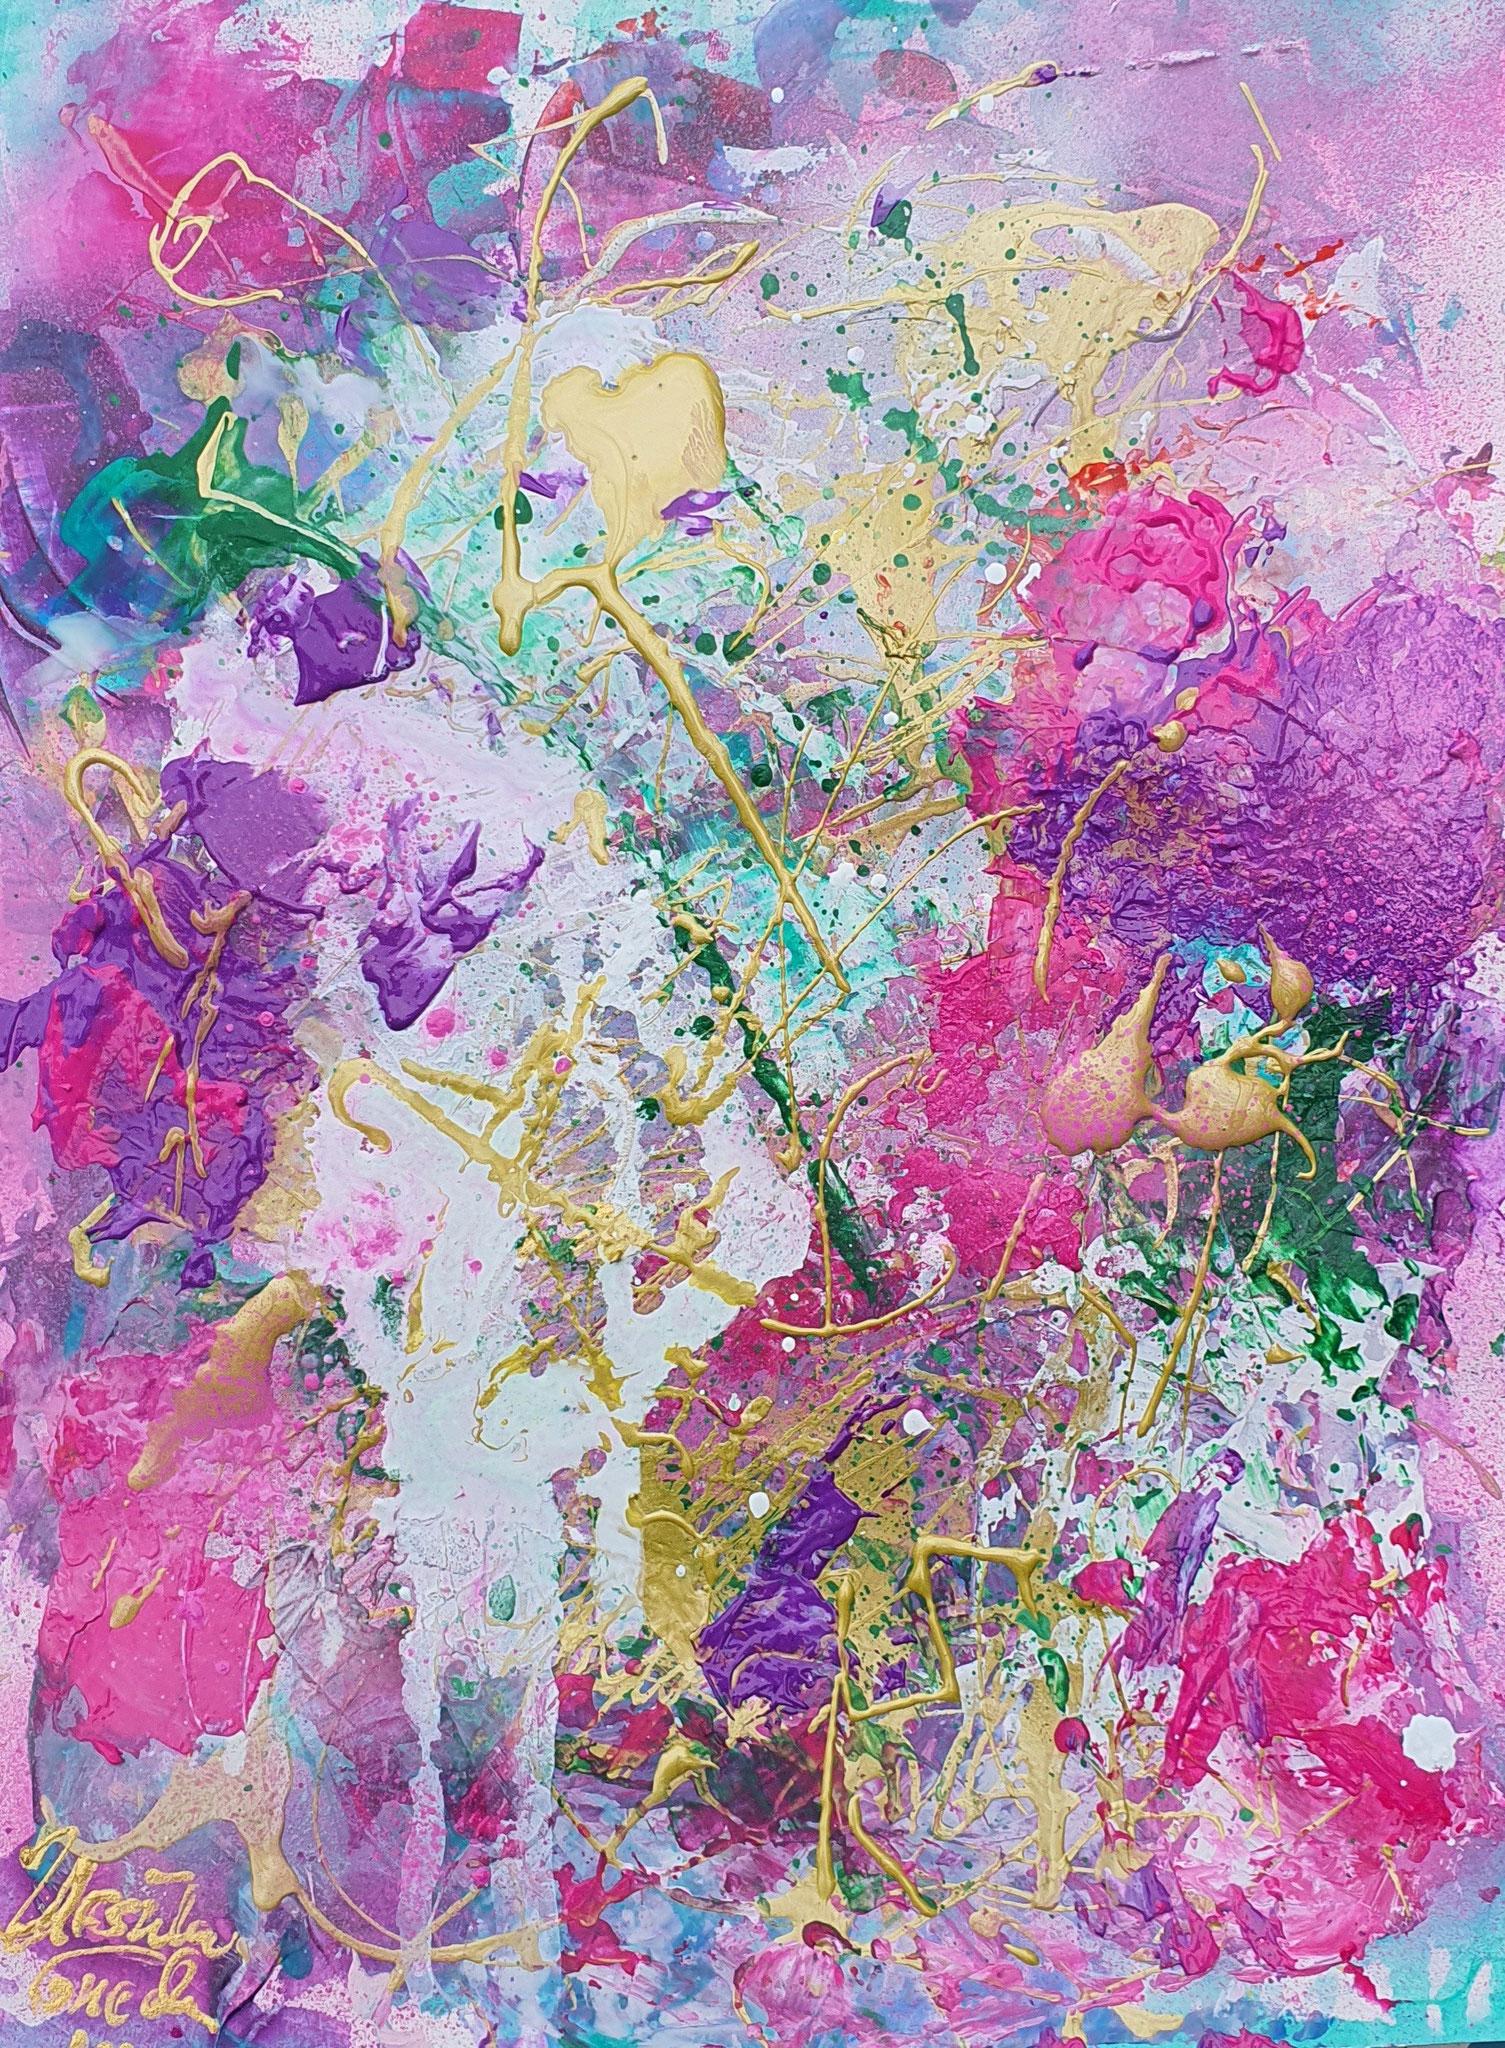 Summertime 2021 (Technik: 40 X 30 X 0,02 cm auf Special-Acryl-Papier, Mixed Media, abstract)